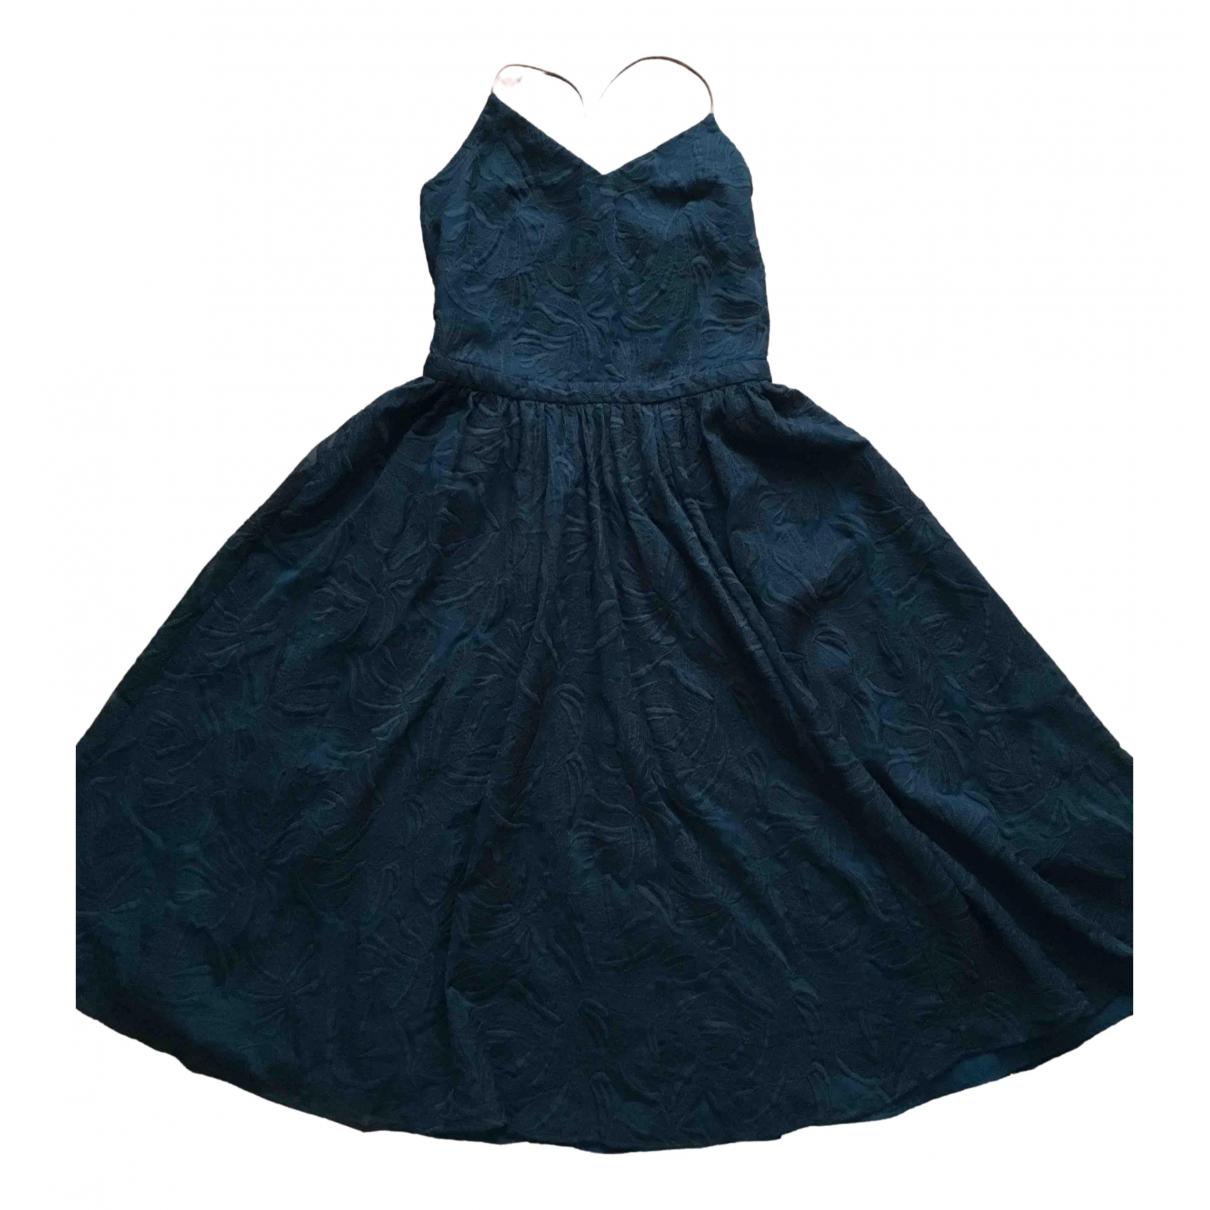 Sessun \N Kleid in  Gruen Baumwolle